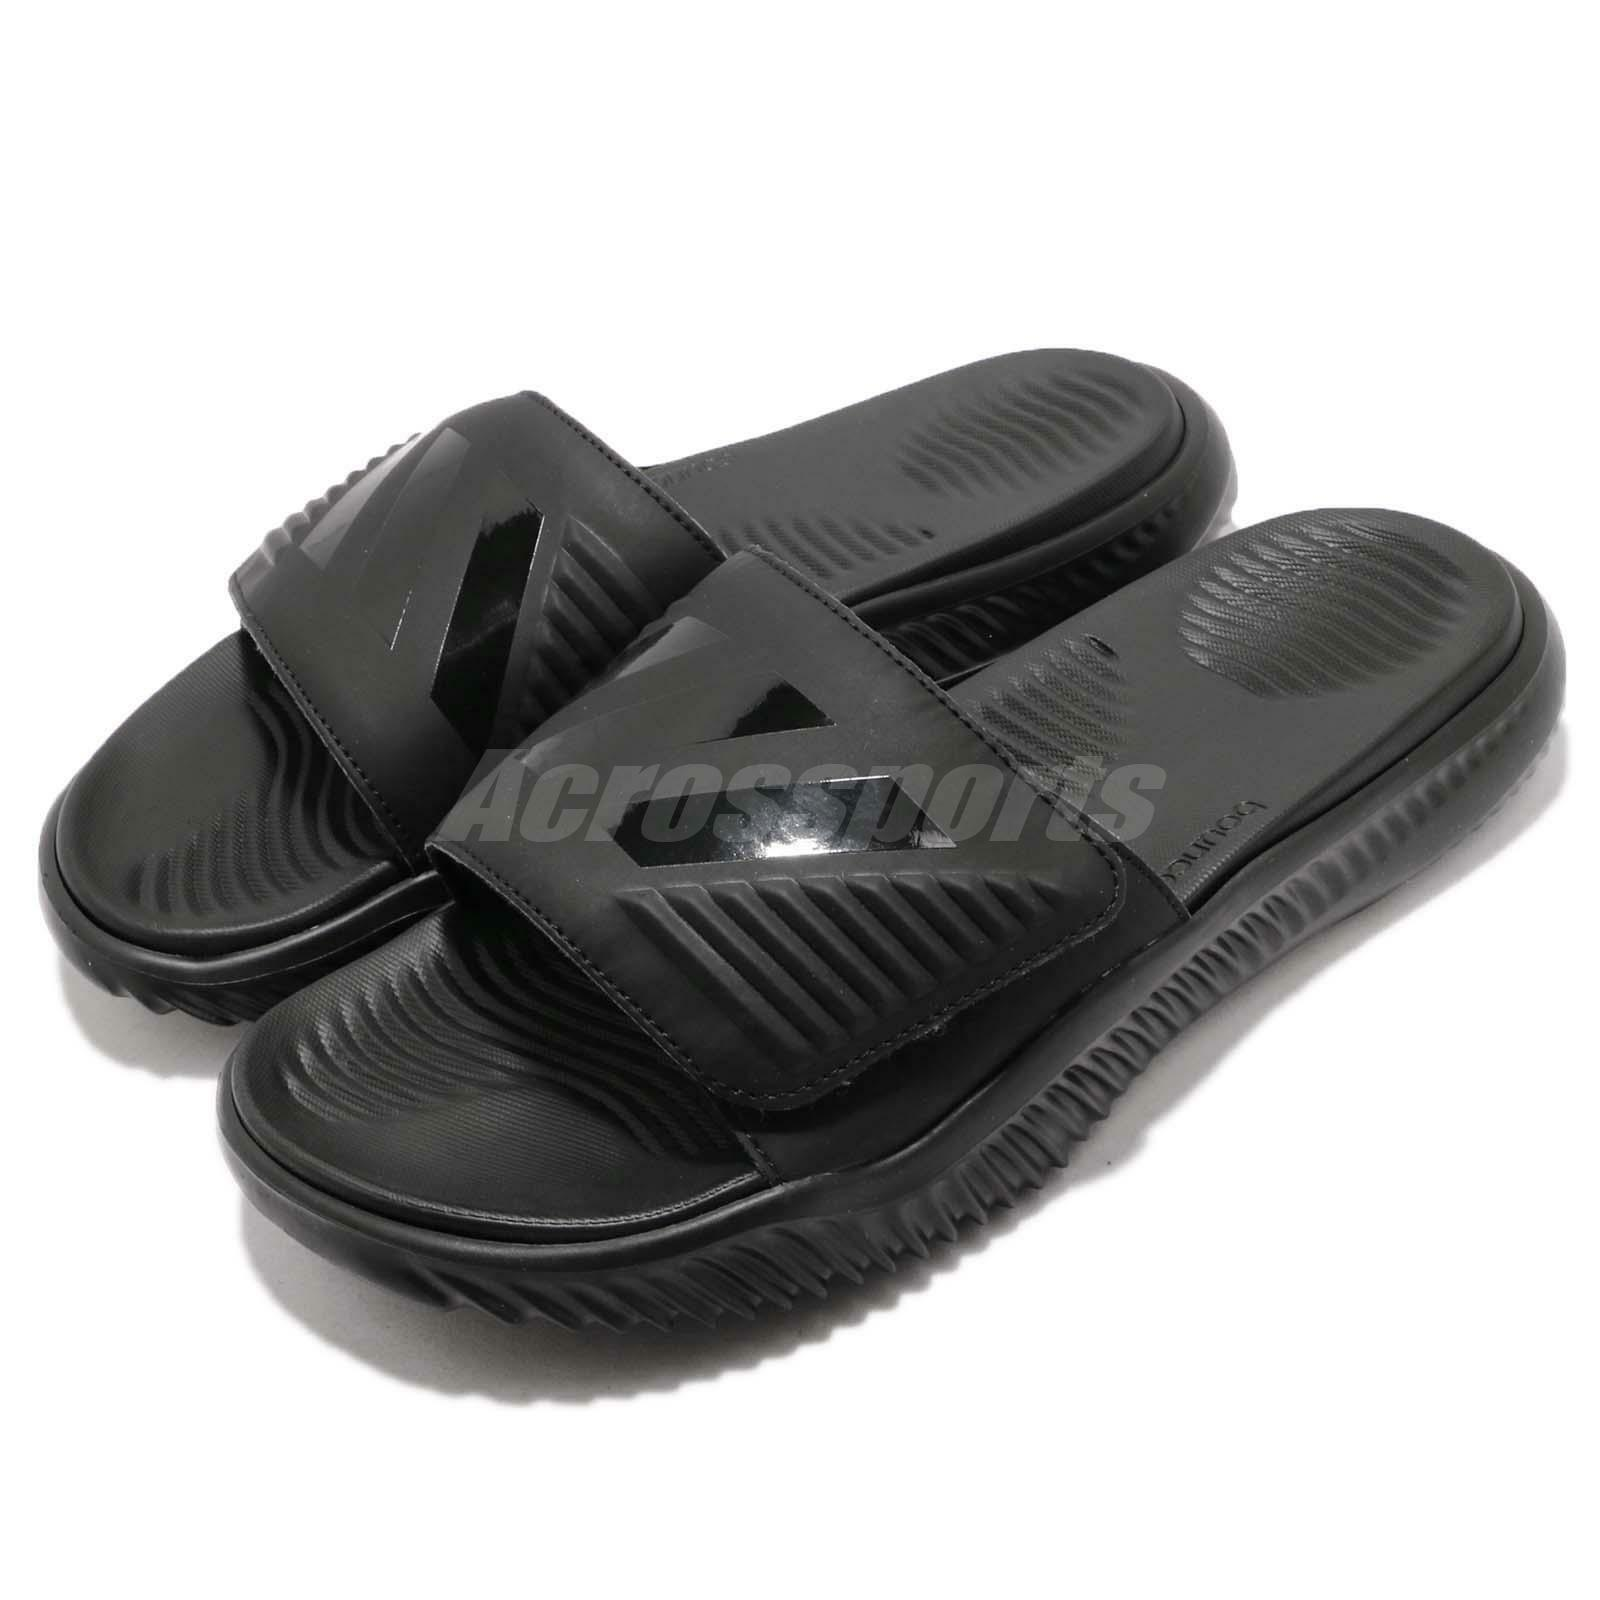 adidas AlphaBounce Slide Triple Black Men Sports Sandals Slippers B41720